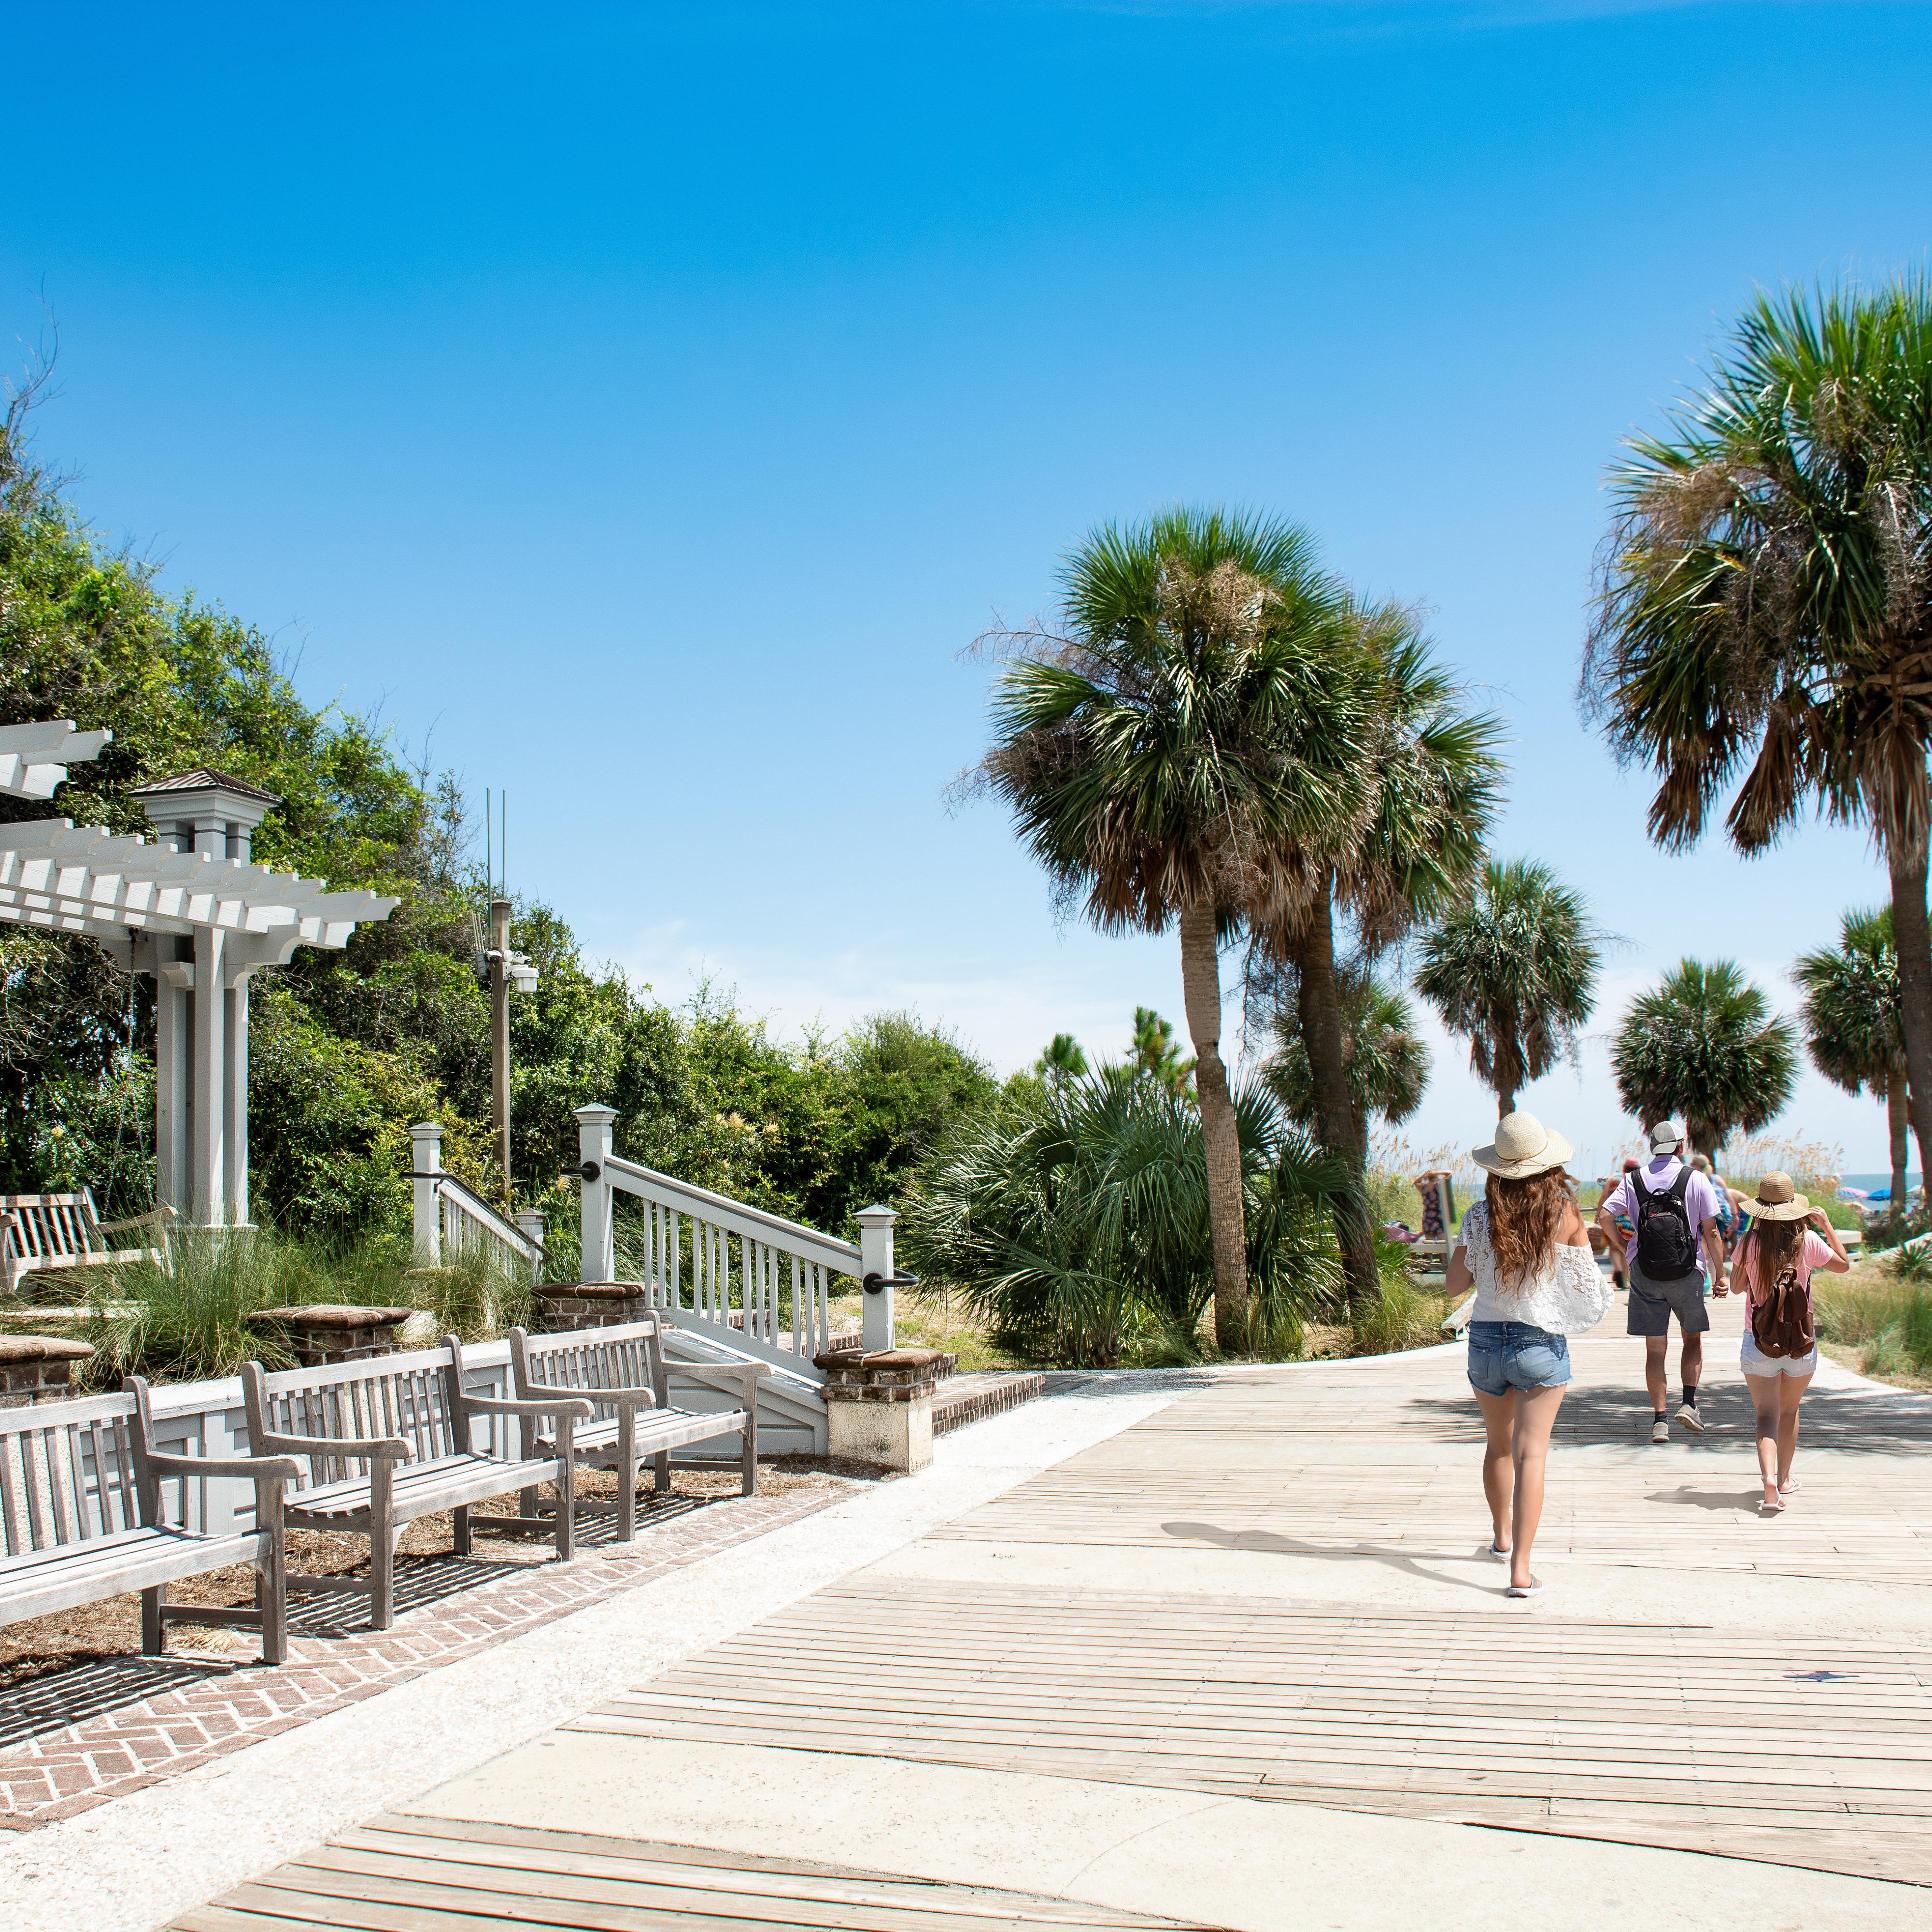 From Hilton Head Island to Bald Head Island, the Carolinas offer prime beach destinations.